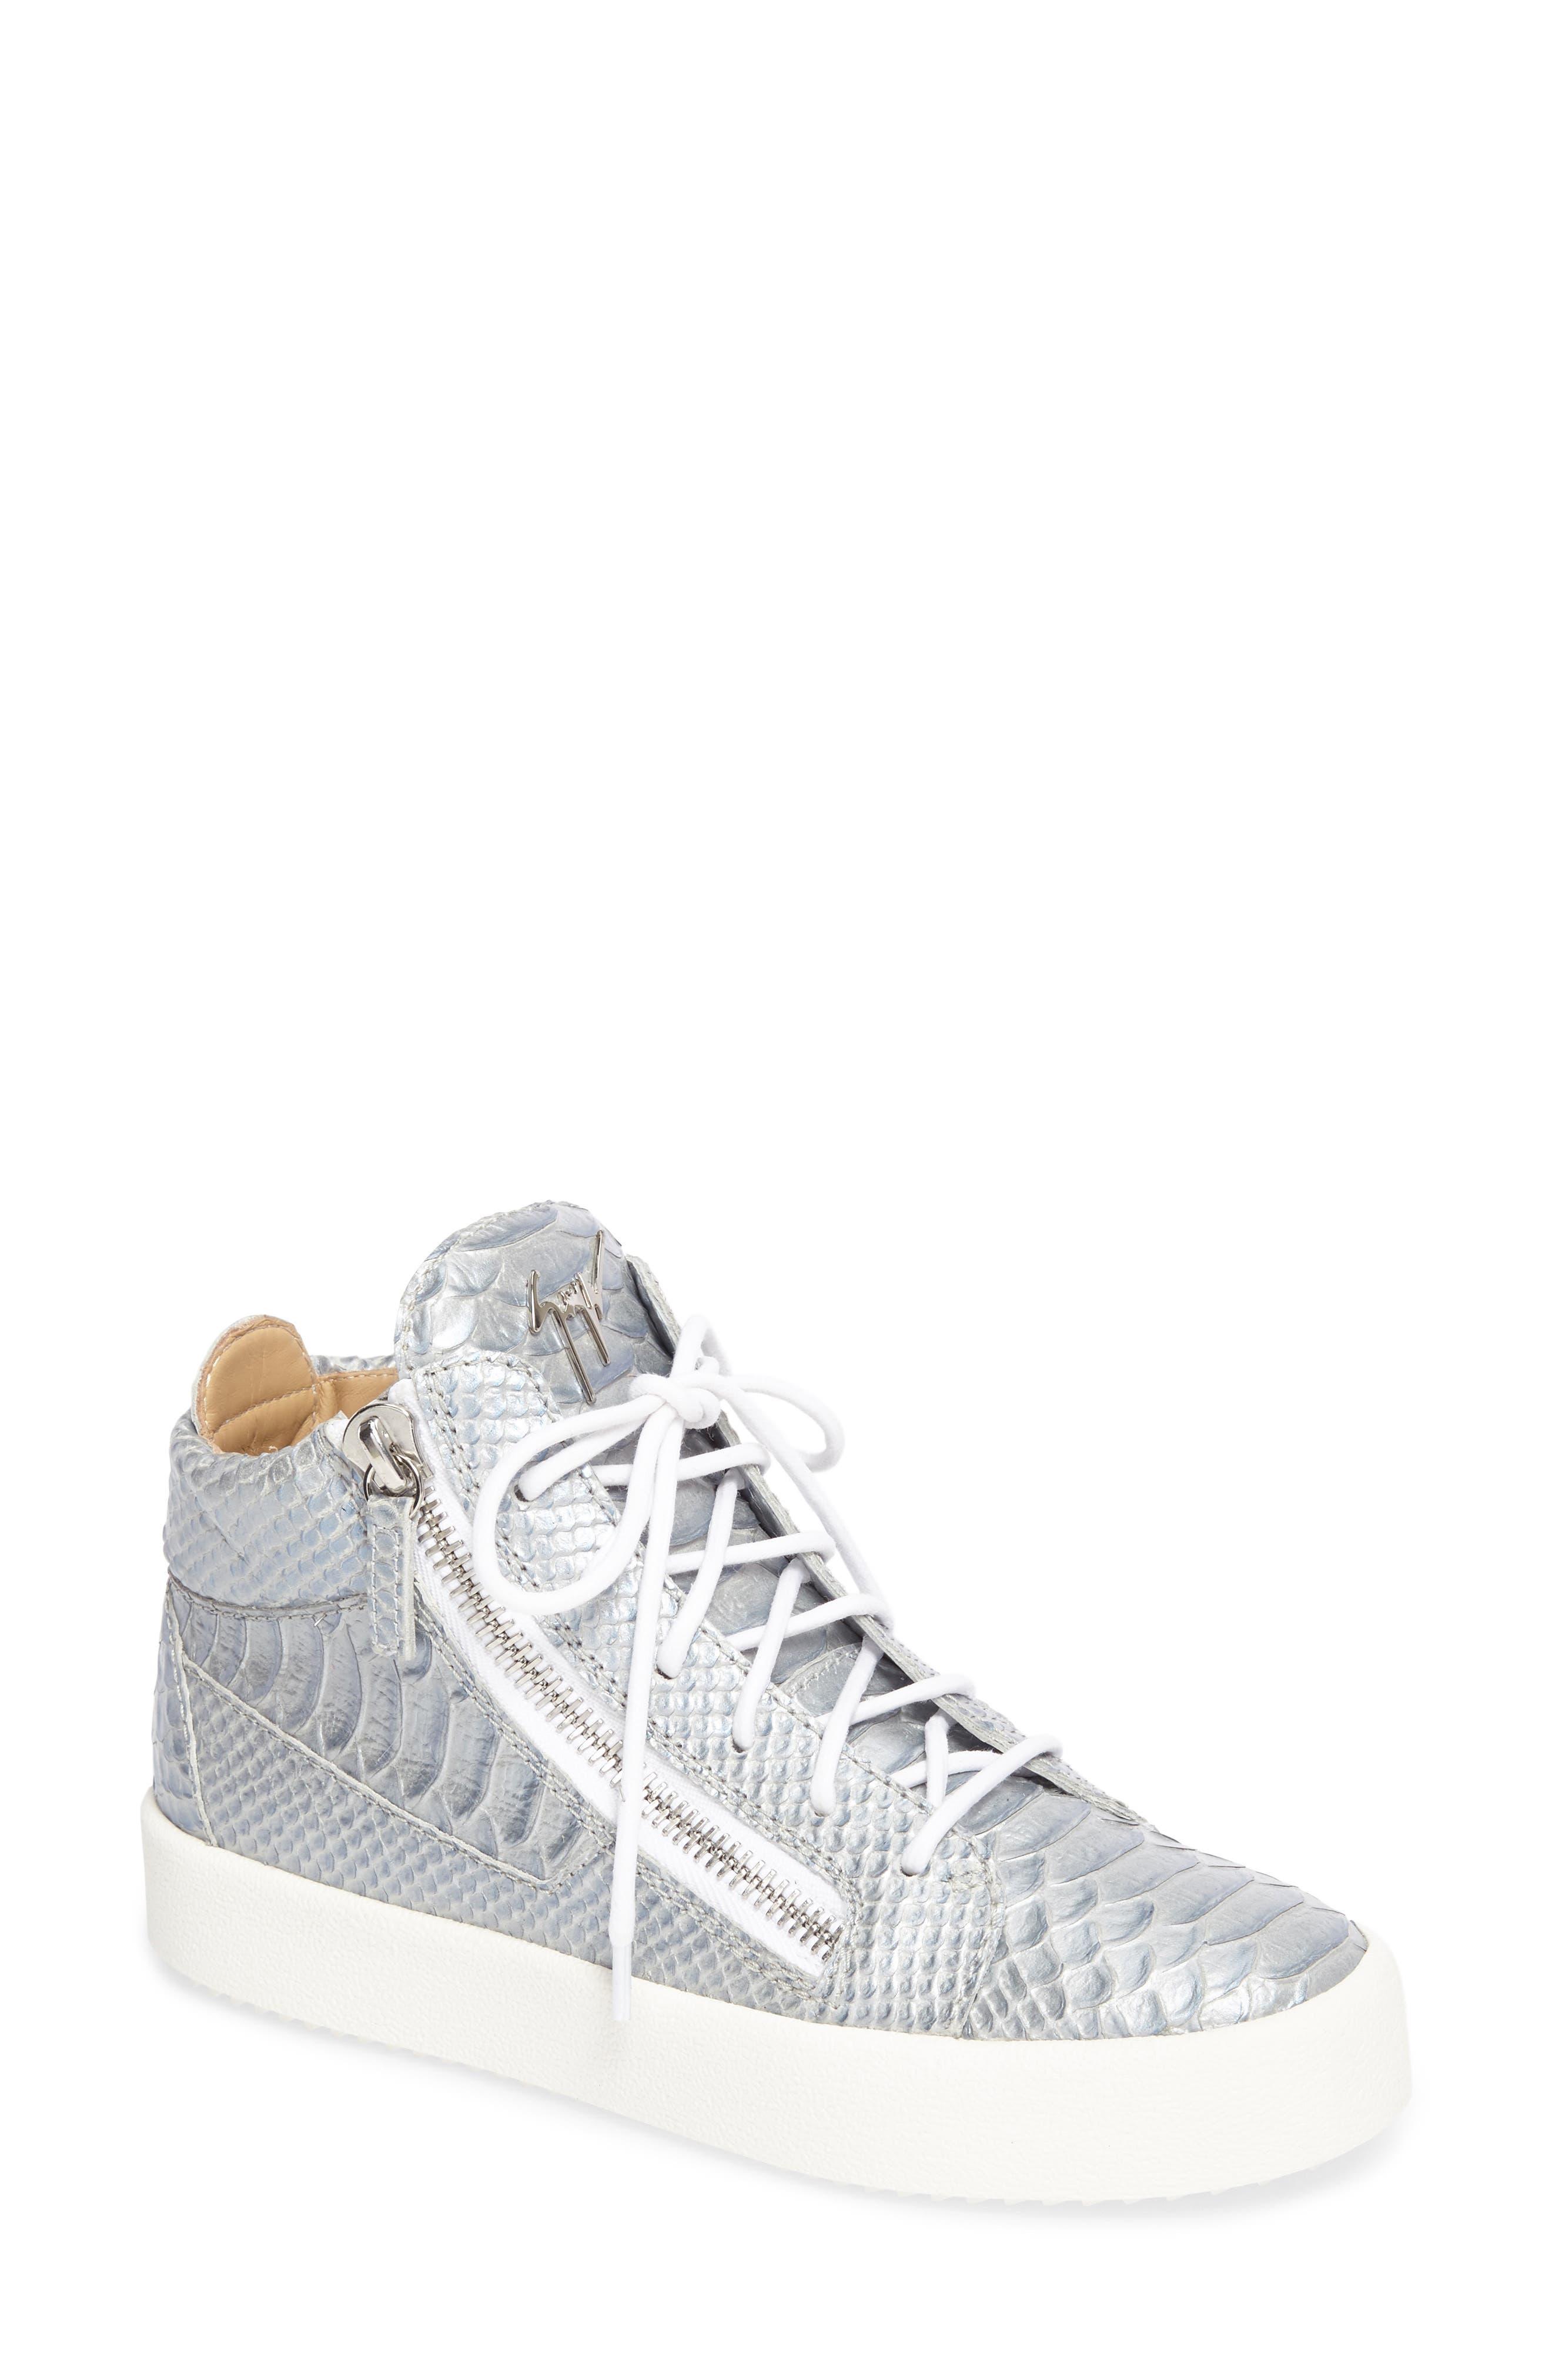 May London Mid Top Sneaker,                         Main,                         color, 020